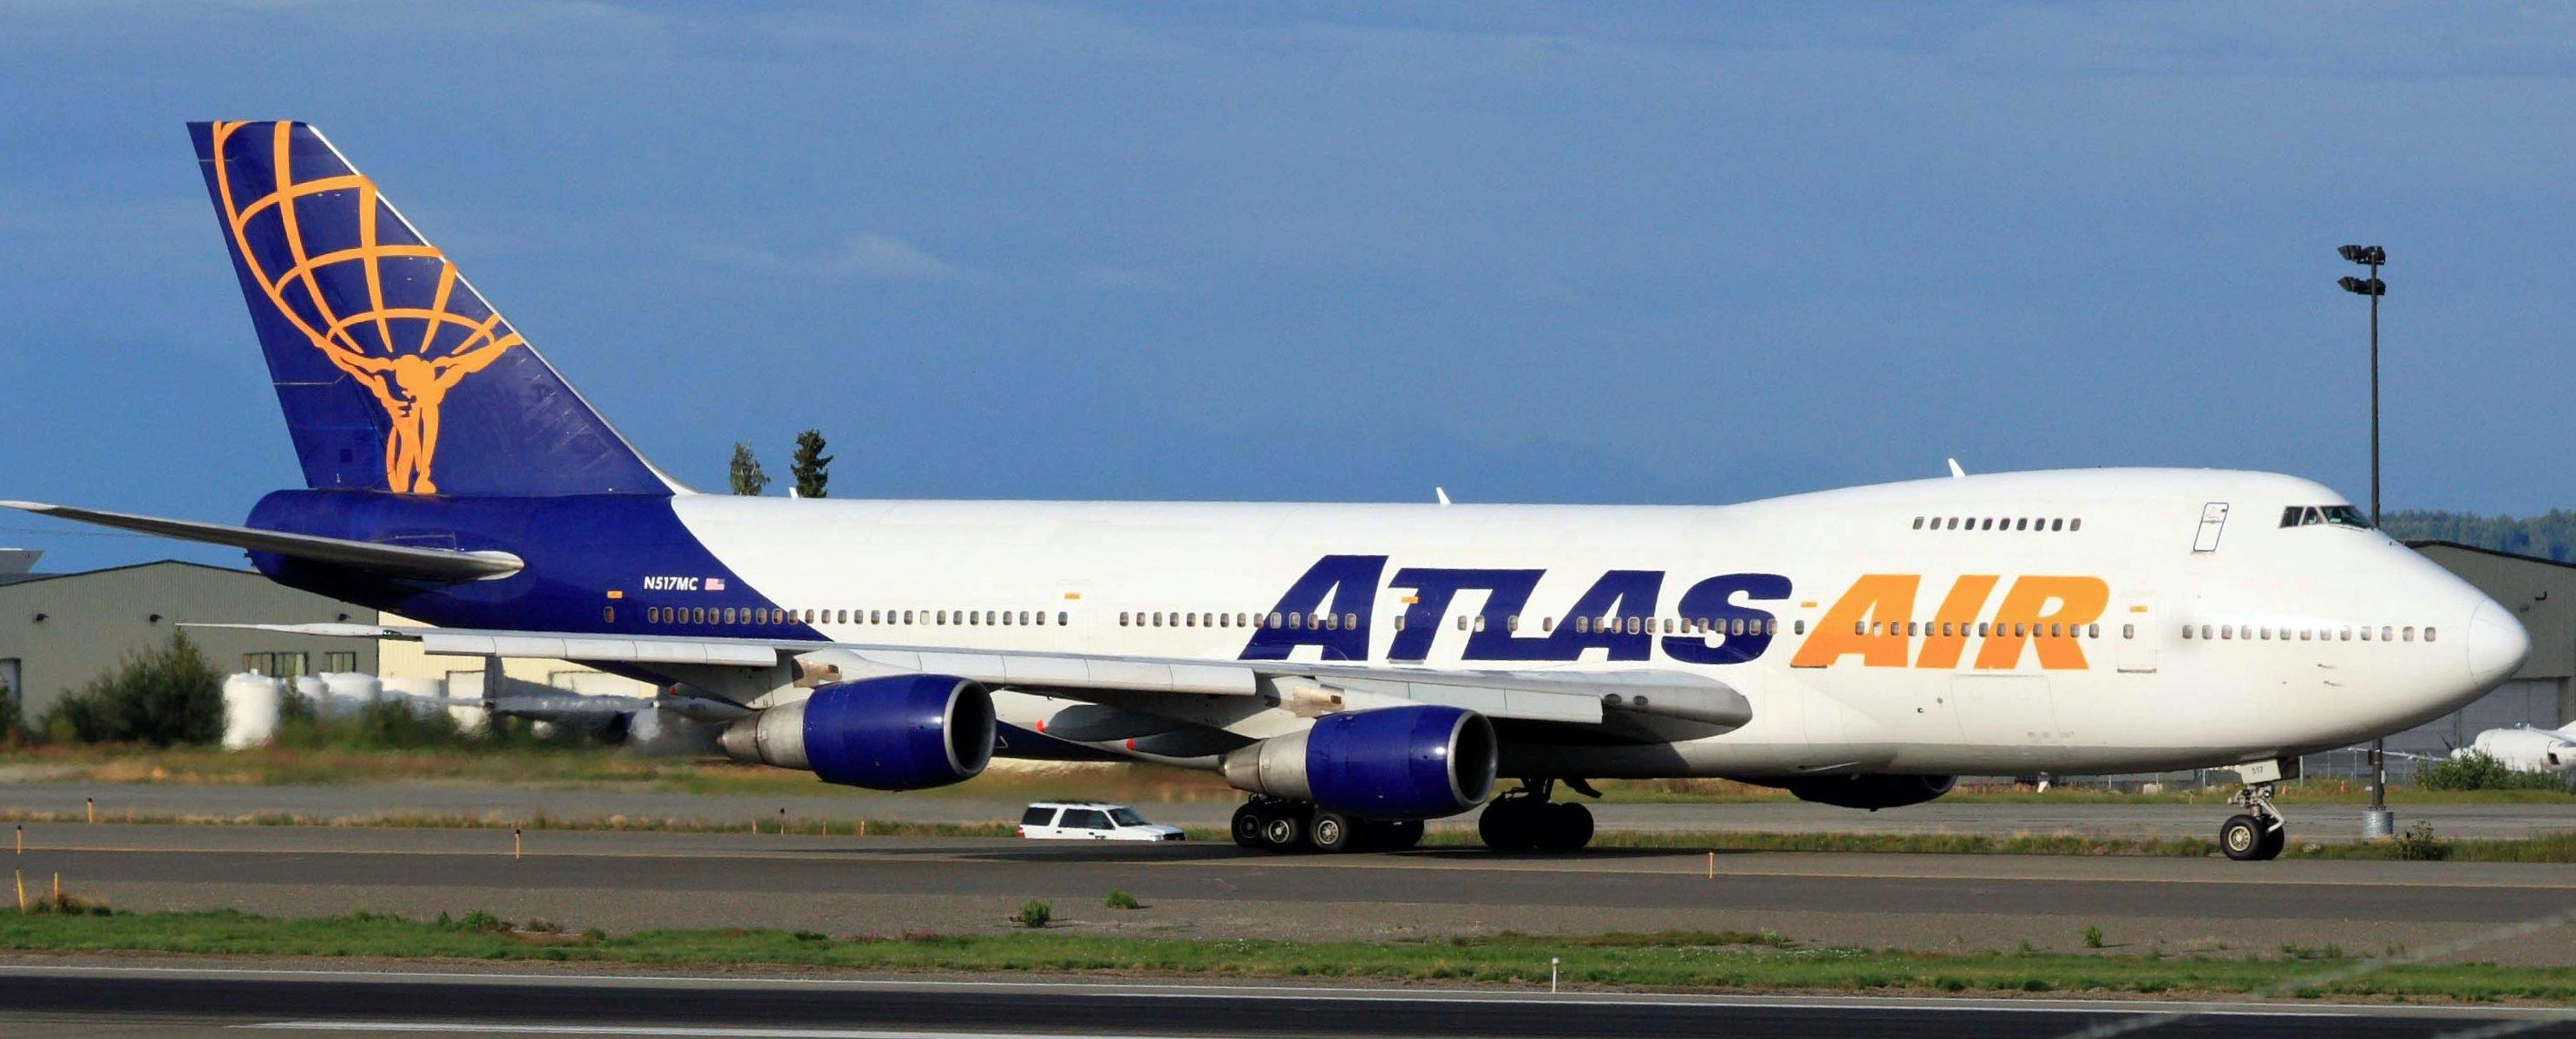 Air Travel Vs Transportation Word Type